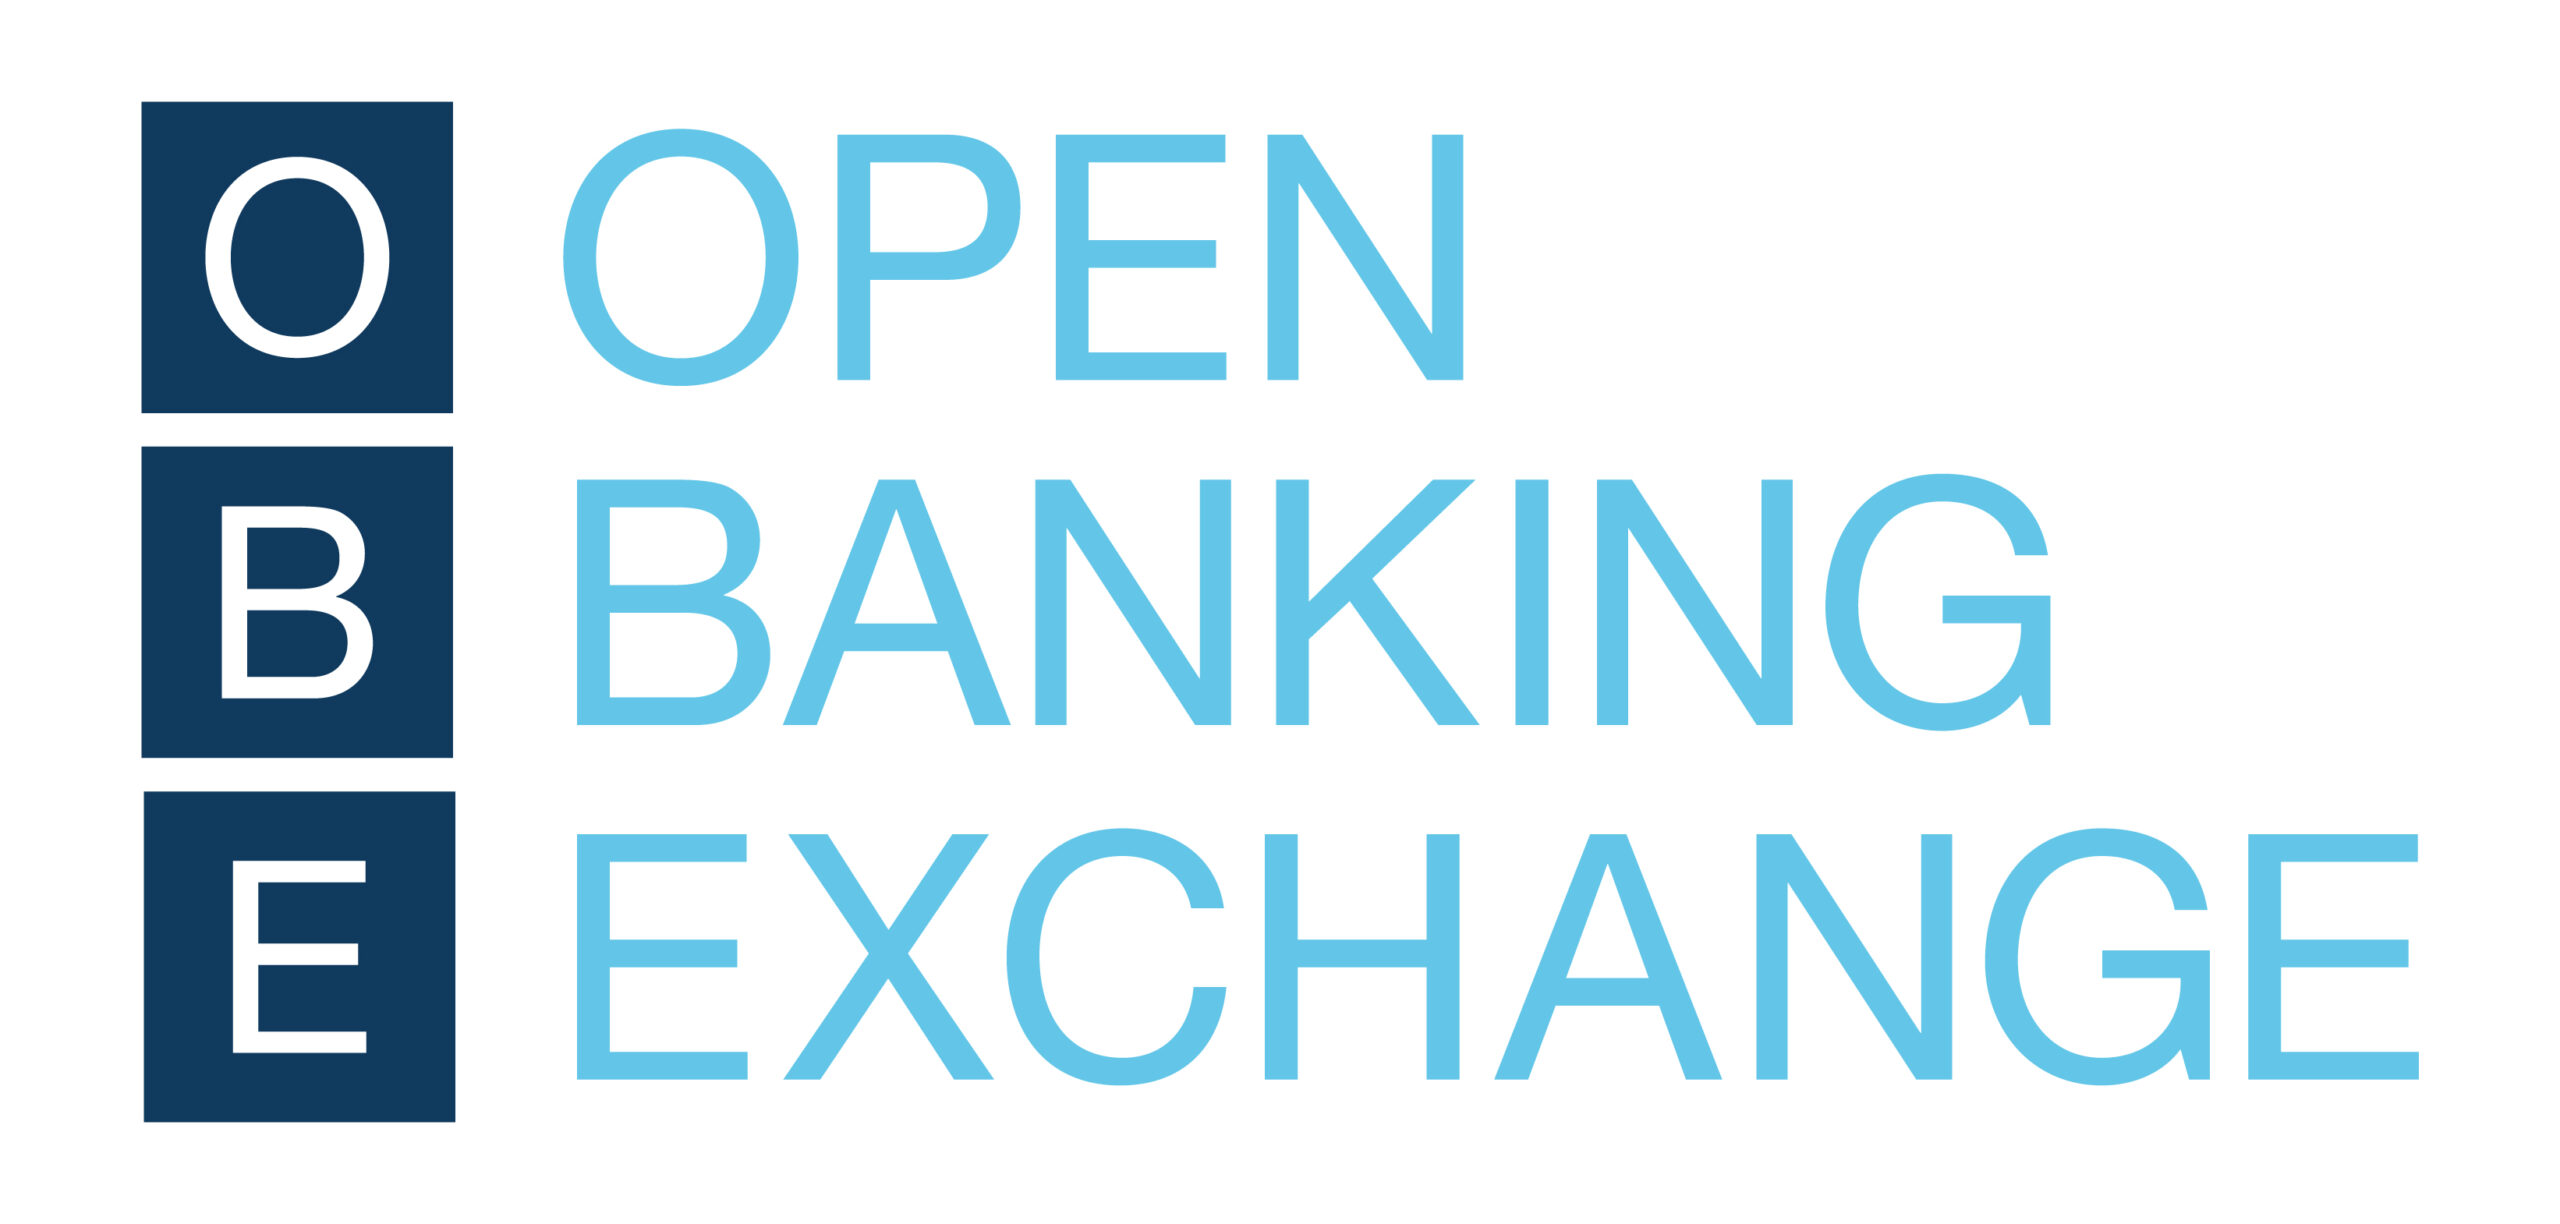 Open Banking Exchange Logo 29042021 Blue Light Blue scaled - Konsentus launches Open Banking Exchange